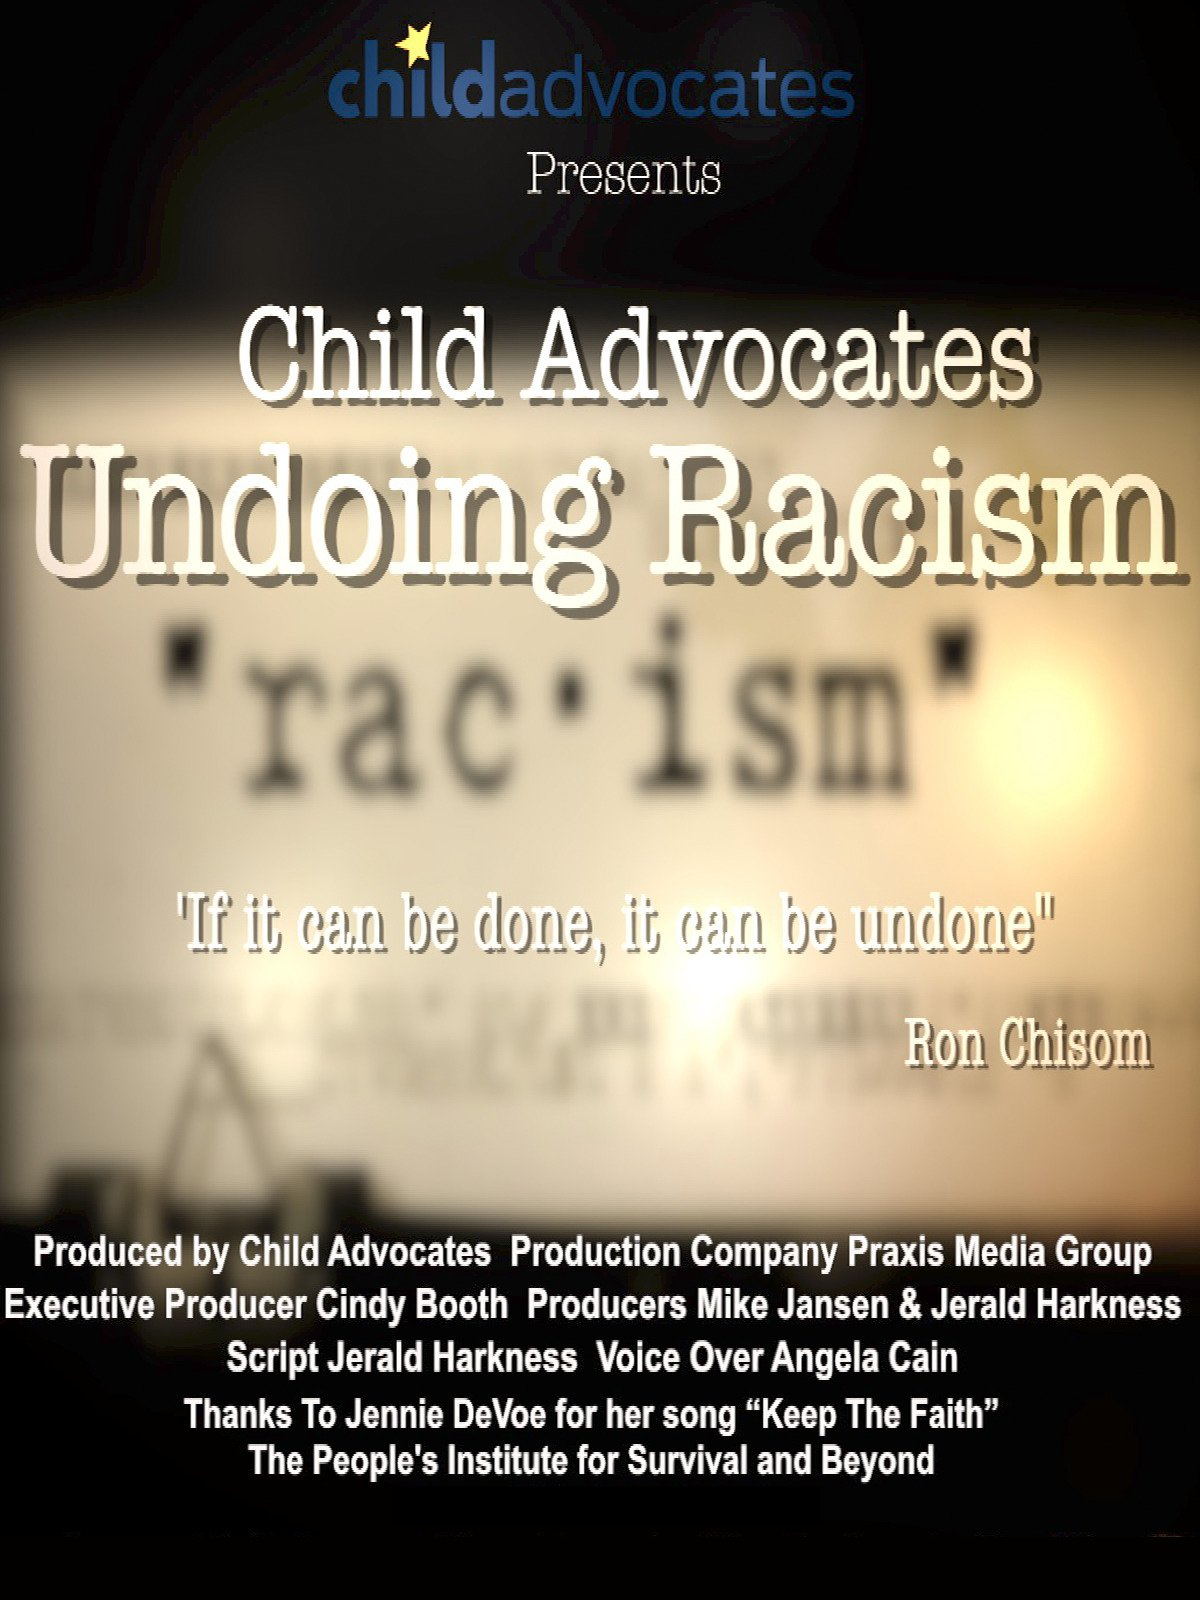 Child Advocates Undoing Racism